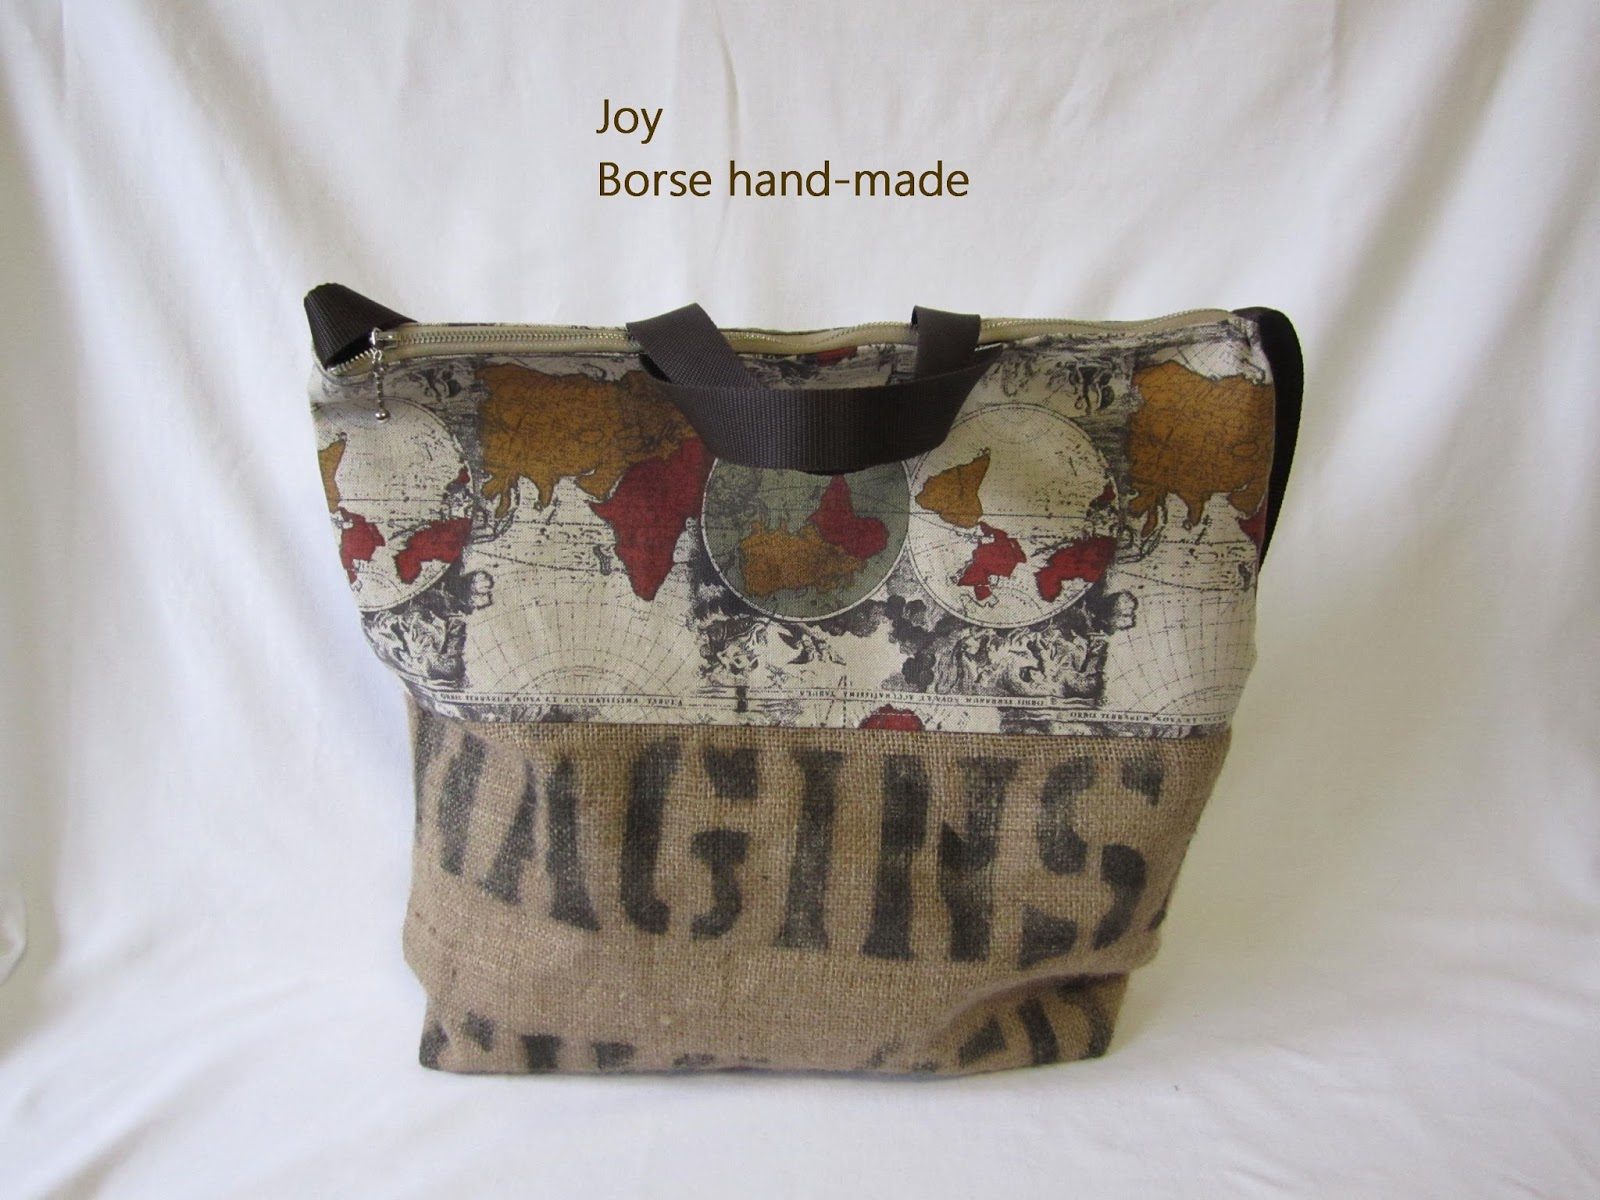 Borse Di Stoffa A Sacco : Joy le borse hand made recupero di sacco juta n